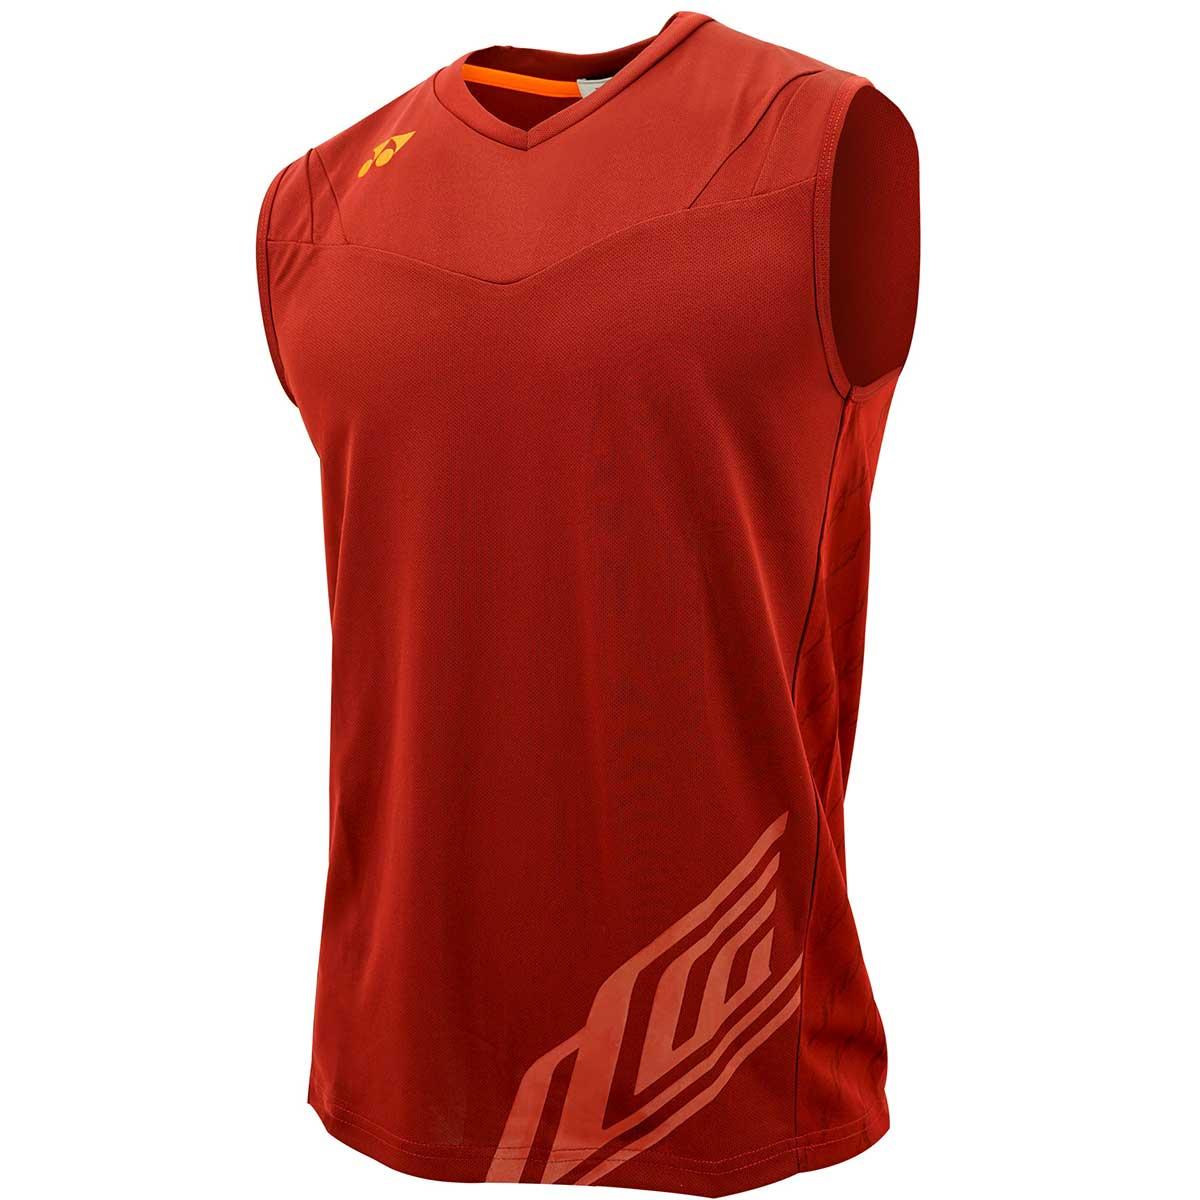 b5d606ee80ee4 Buy Yonex LCW Mens Sleeveless Shirt (10000 - Rhubarb) Online